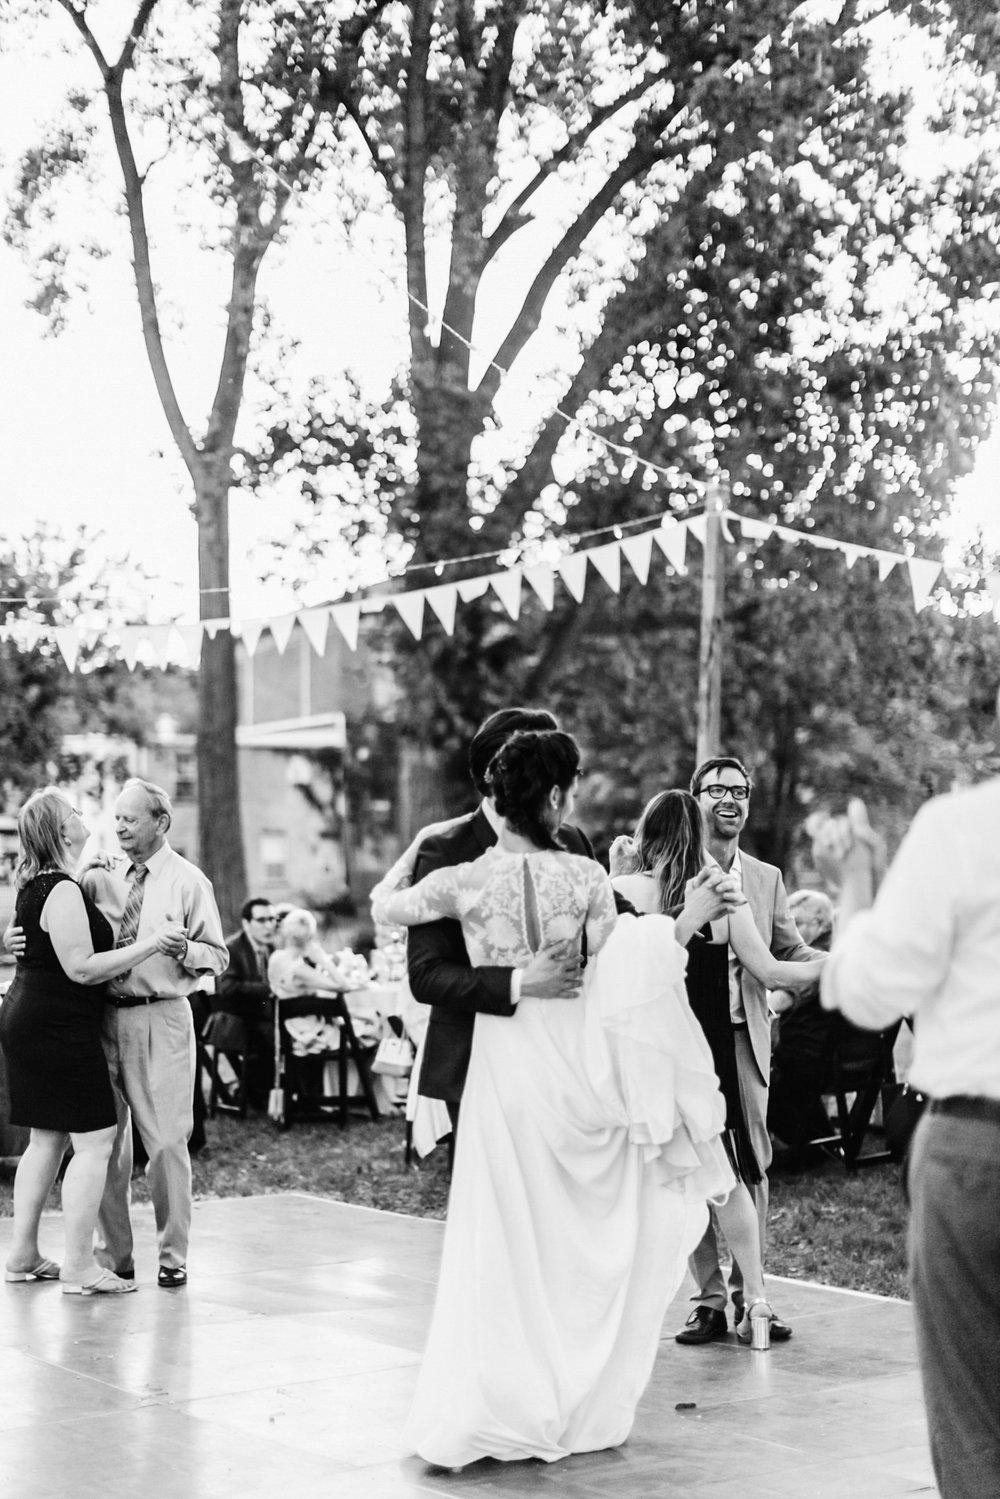 Kimberly-Coccagnia-Wedding-Photographer-258.JPG